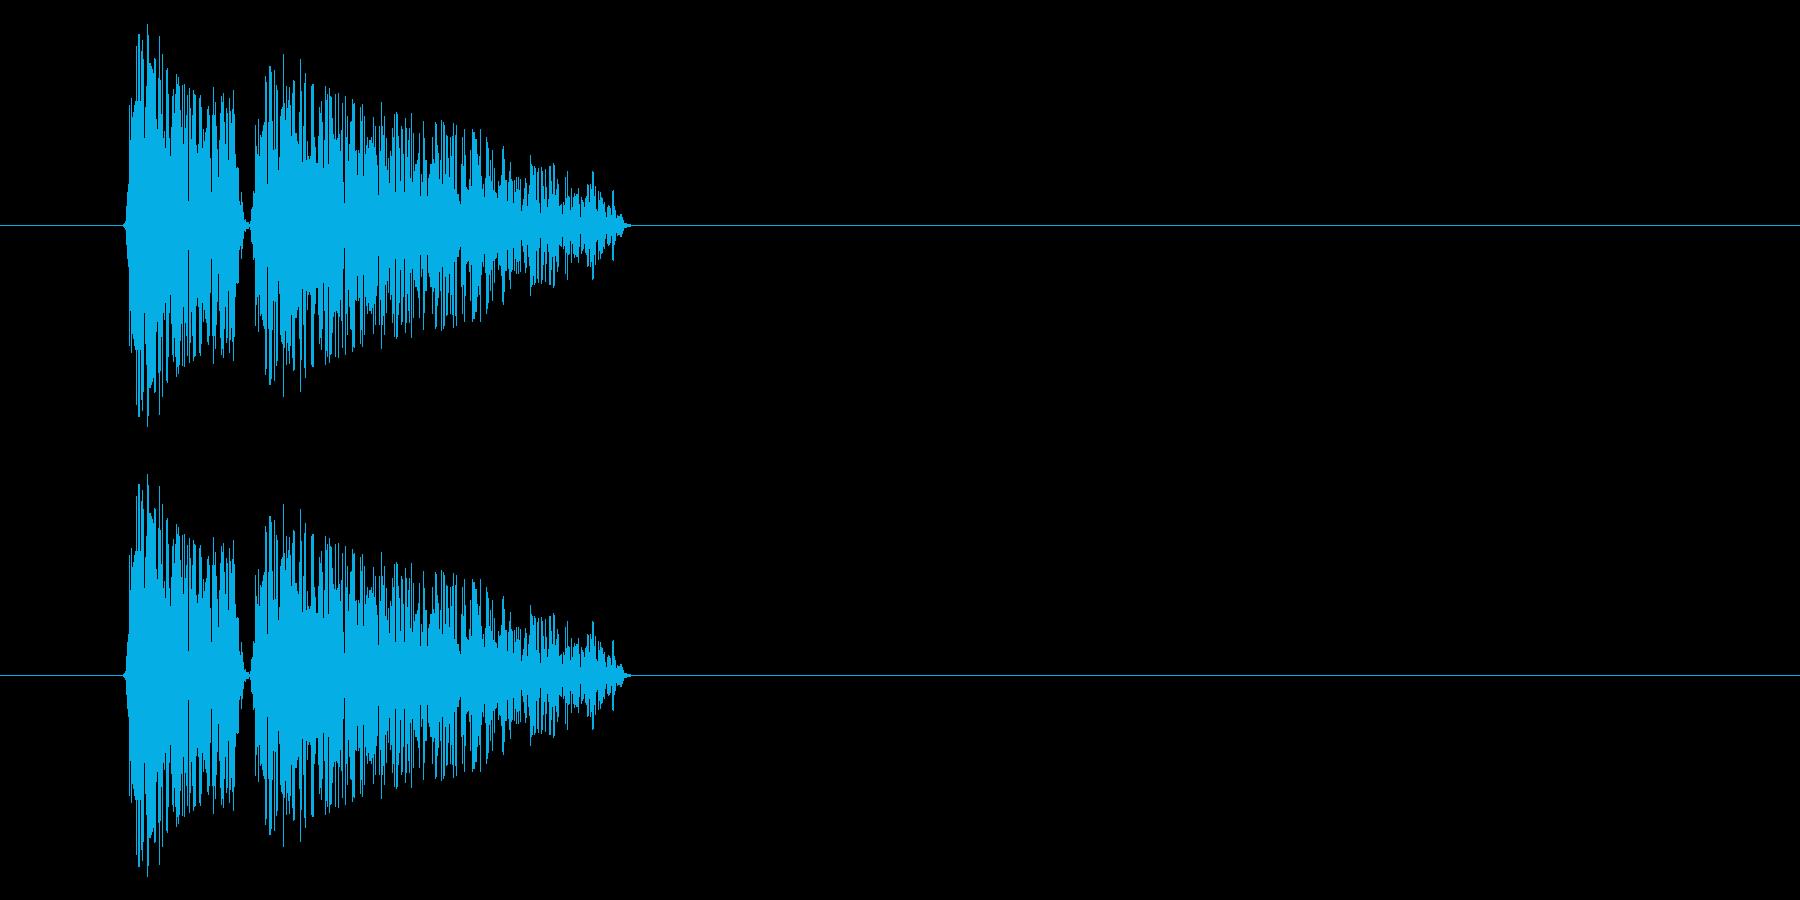 SNES 格闘02-11(ドラム缶)の再生済みの波形